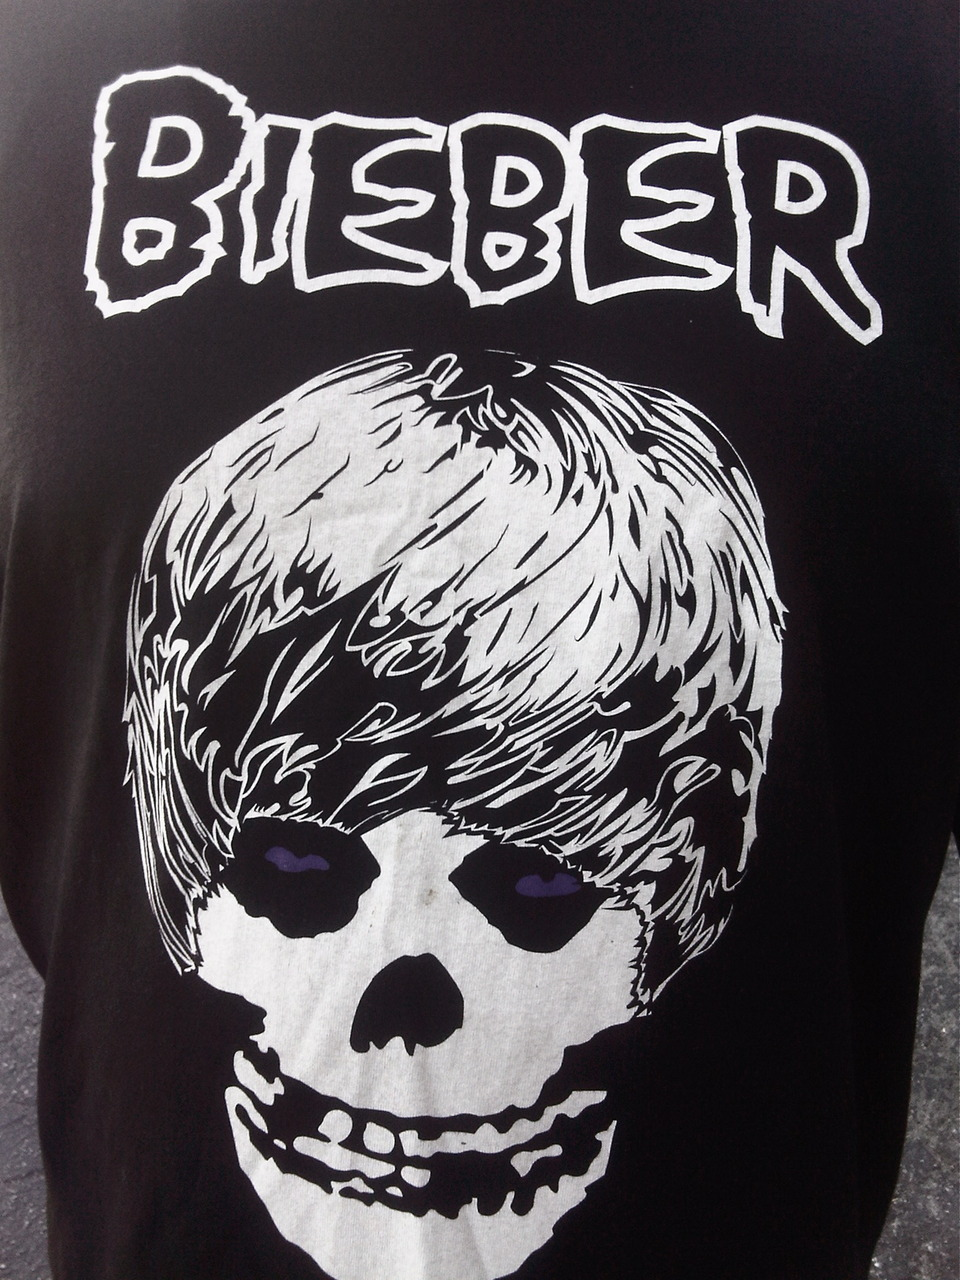 Justin Bieber crew shirt. Los Angeles, CA